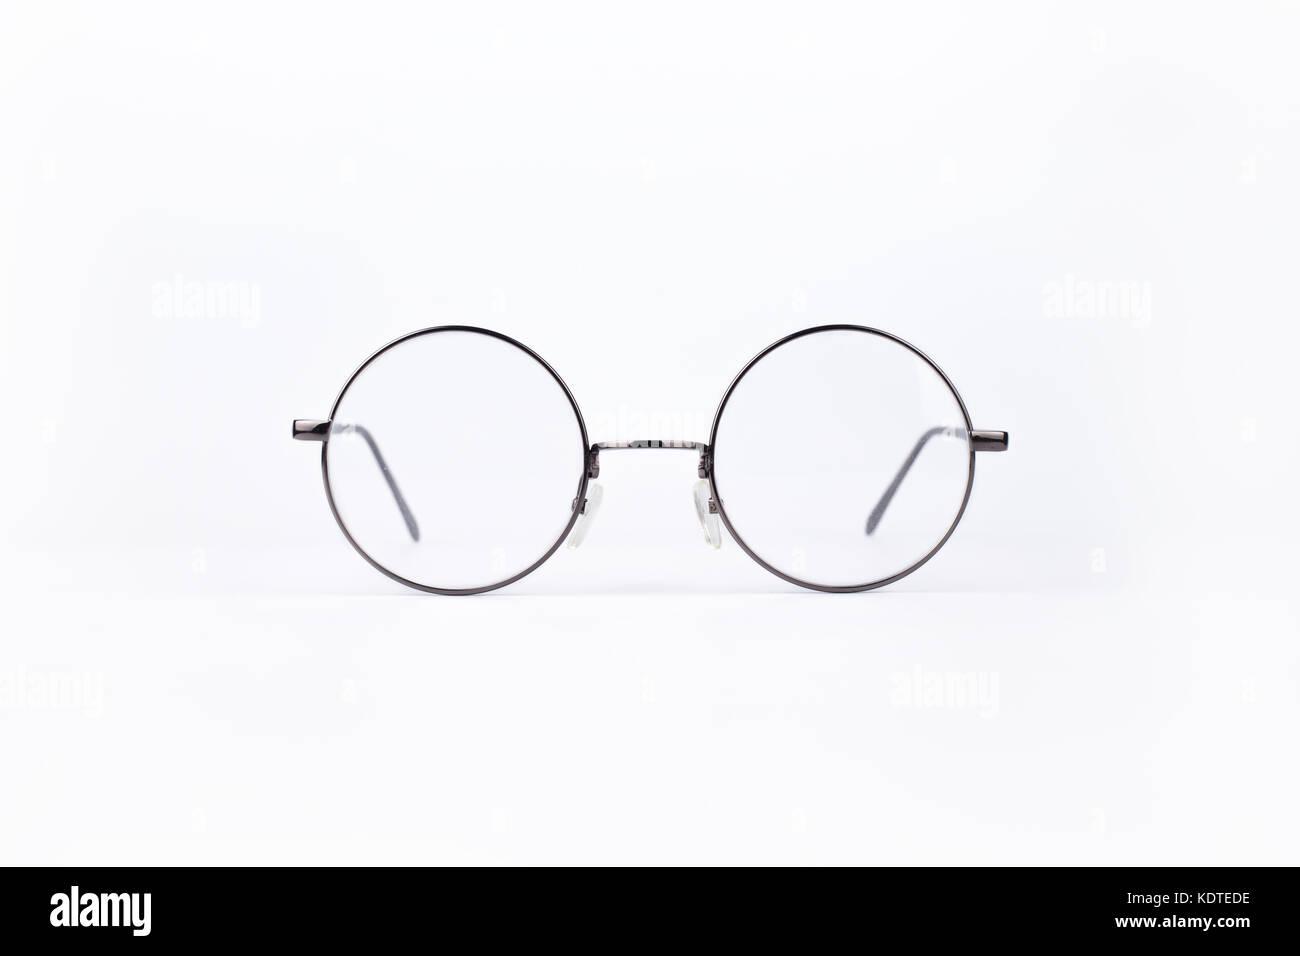 803cbe4e85e24 Circle glasses Stock Photo  163422042 - Alamy